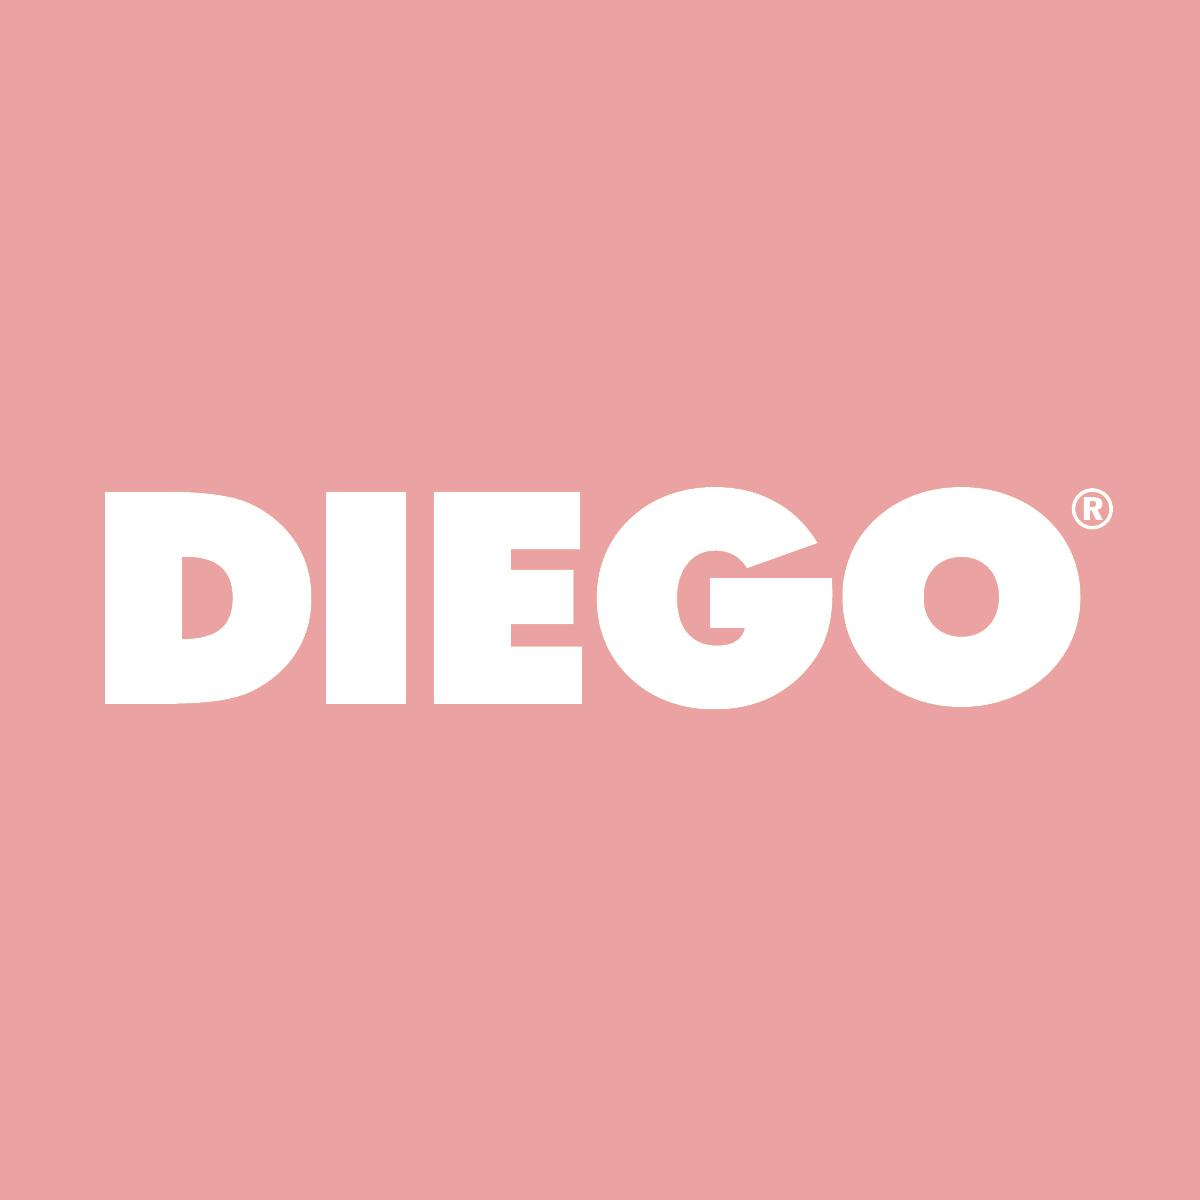 Imagine beige szőnyeg